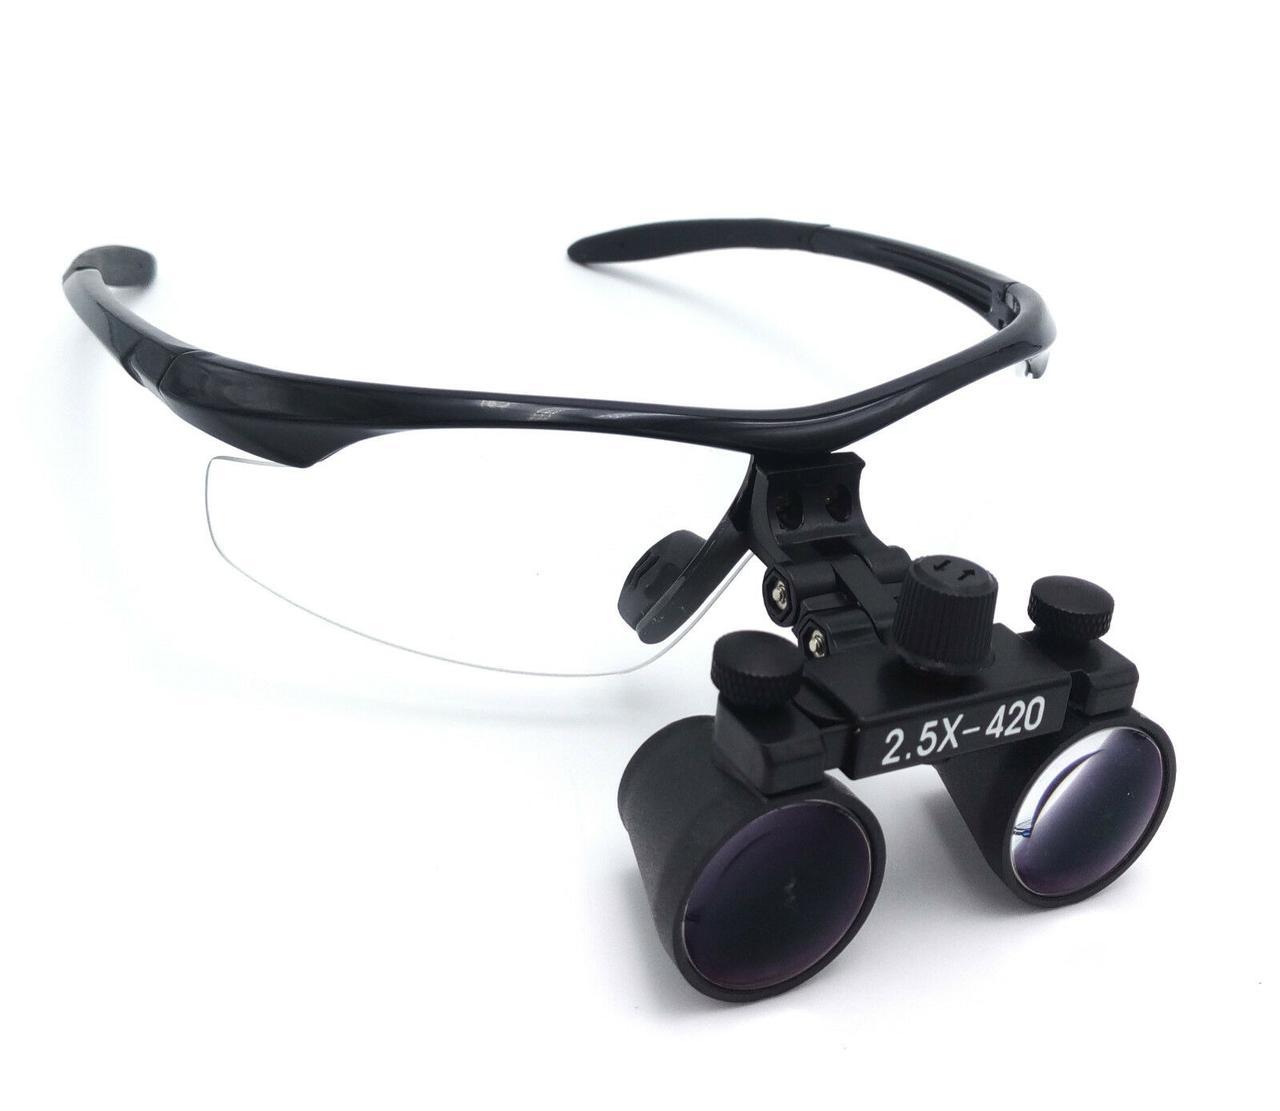 Бинокуляры B1 (2.5х-420) black